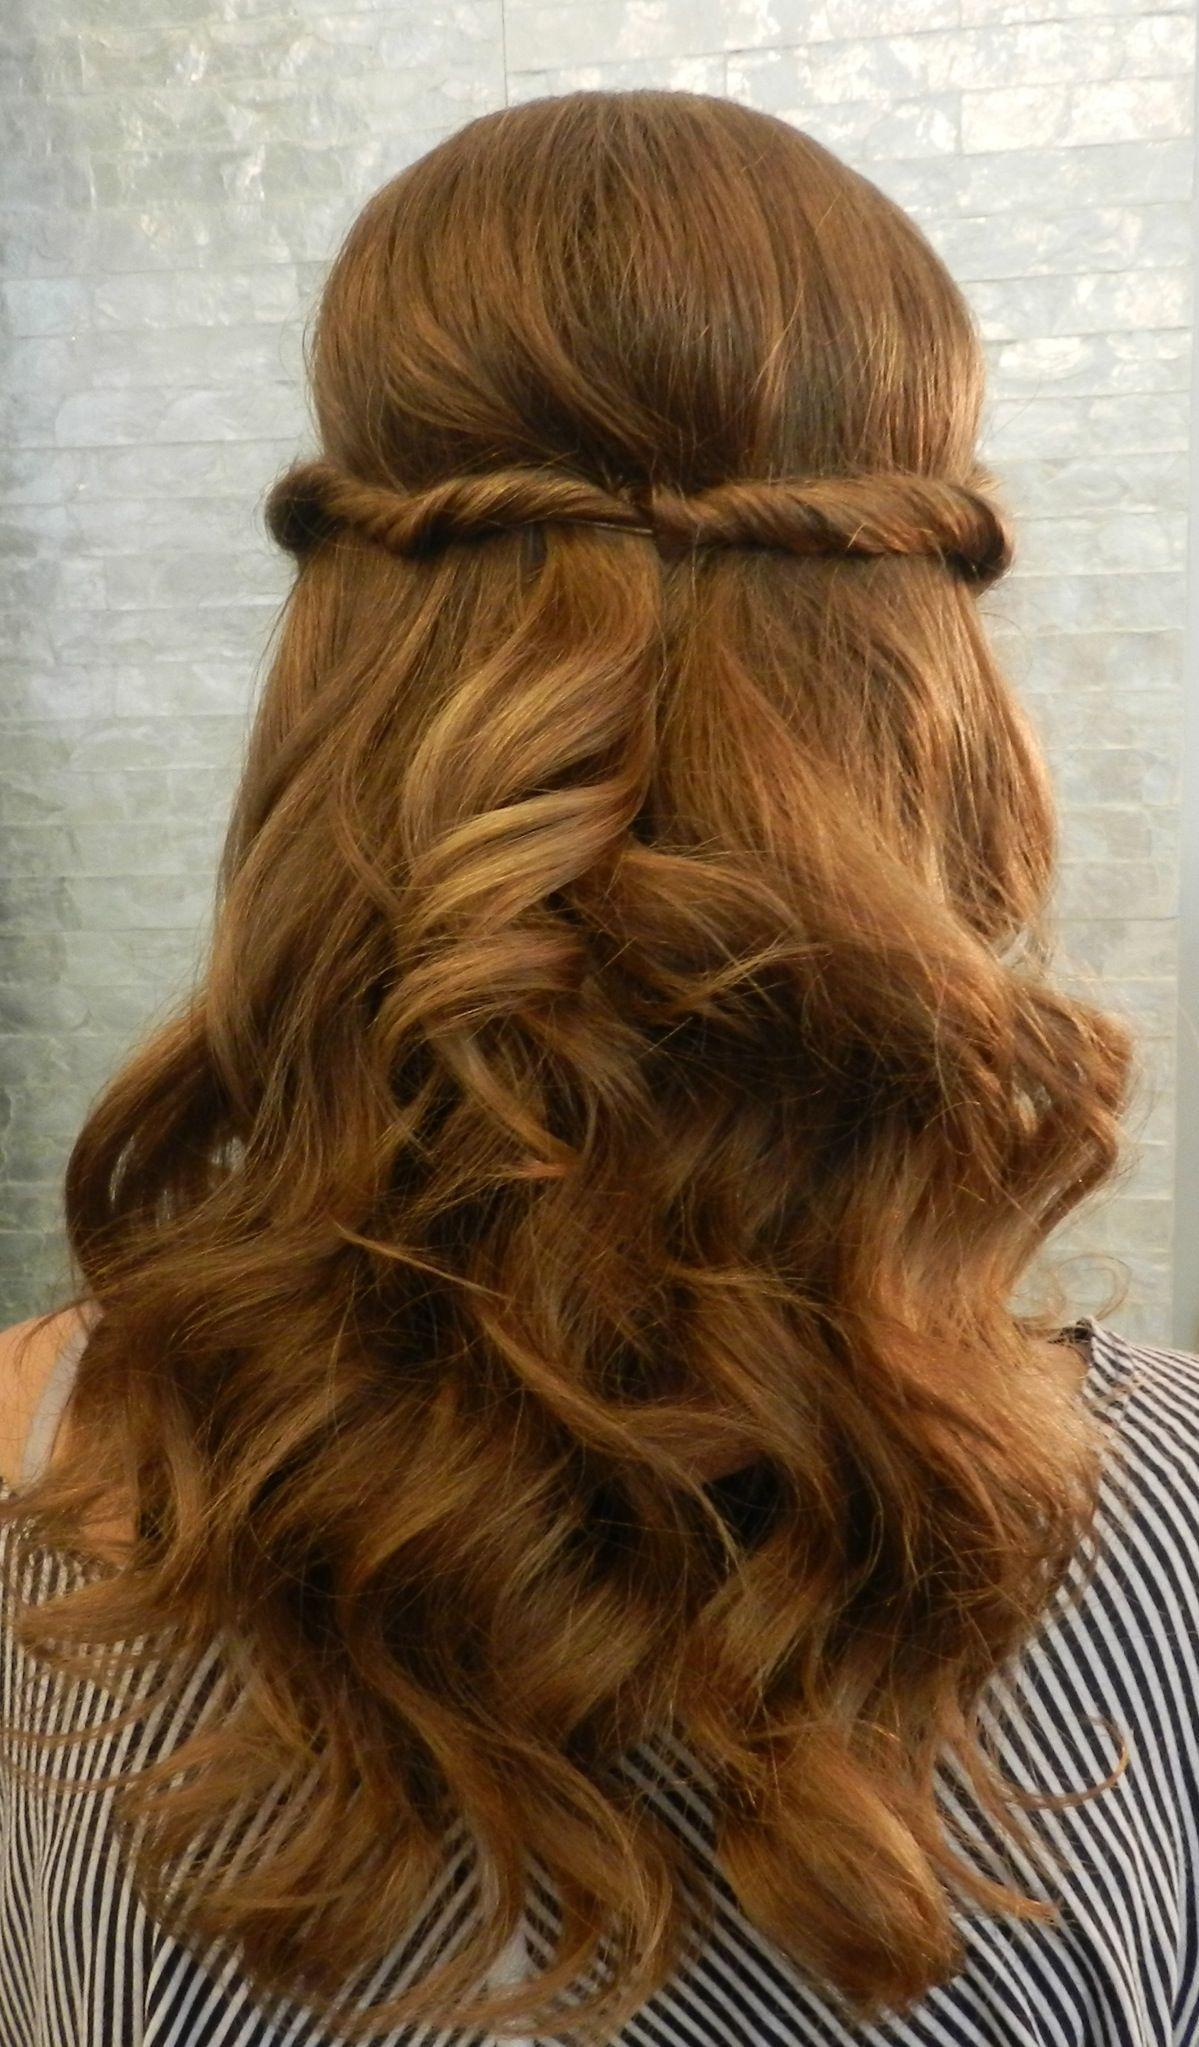 Einzigartige Kosmetik Frisuren Neu Frisuren 2018 Graduation Hairstyles Long Hair Styles Hair Styles